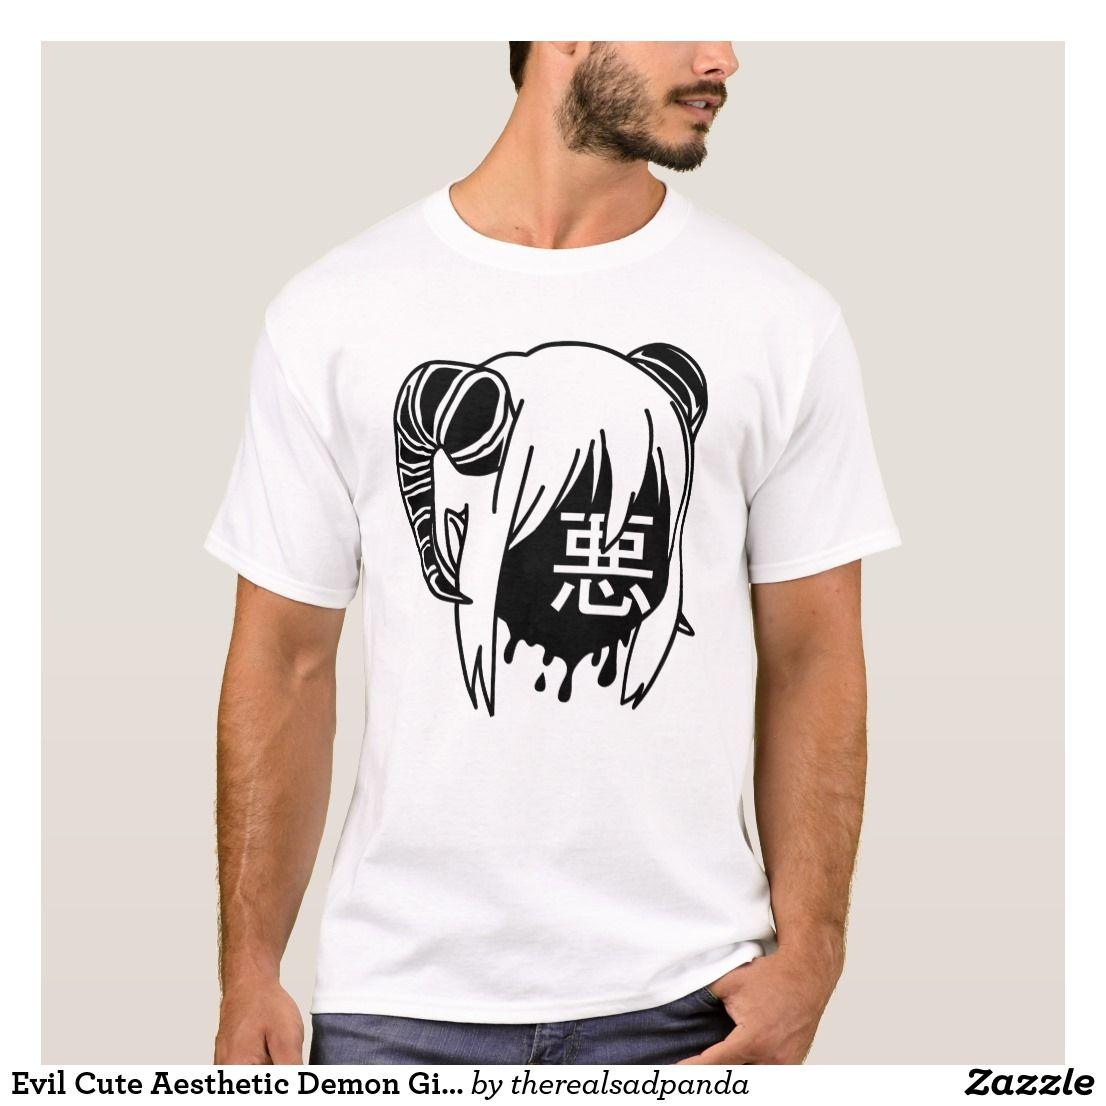 Evil cute aesthetic demon girl tshirt with